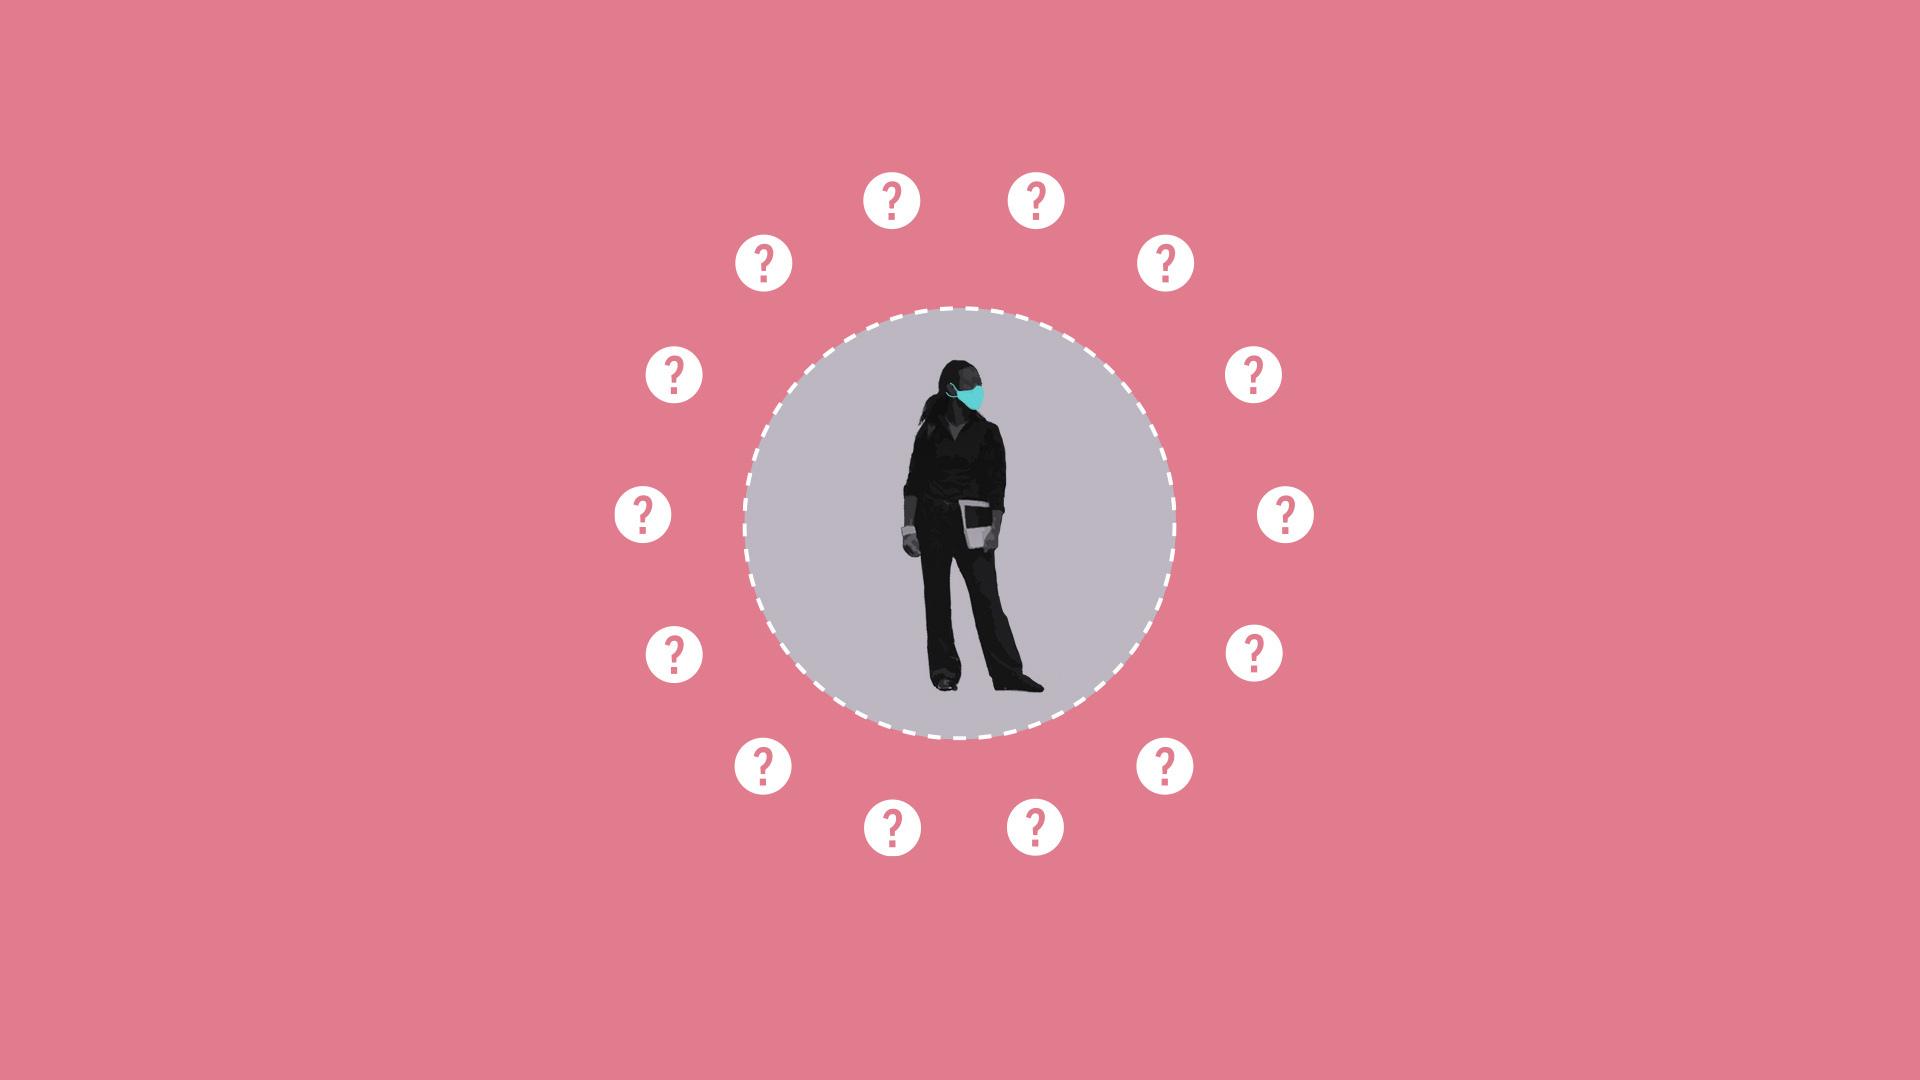 AP-US--Virus Outbreak-Viral Questions-Immune System